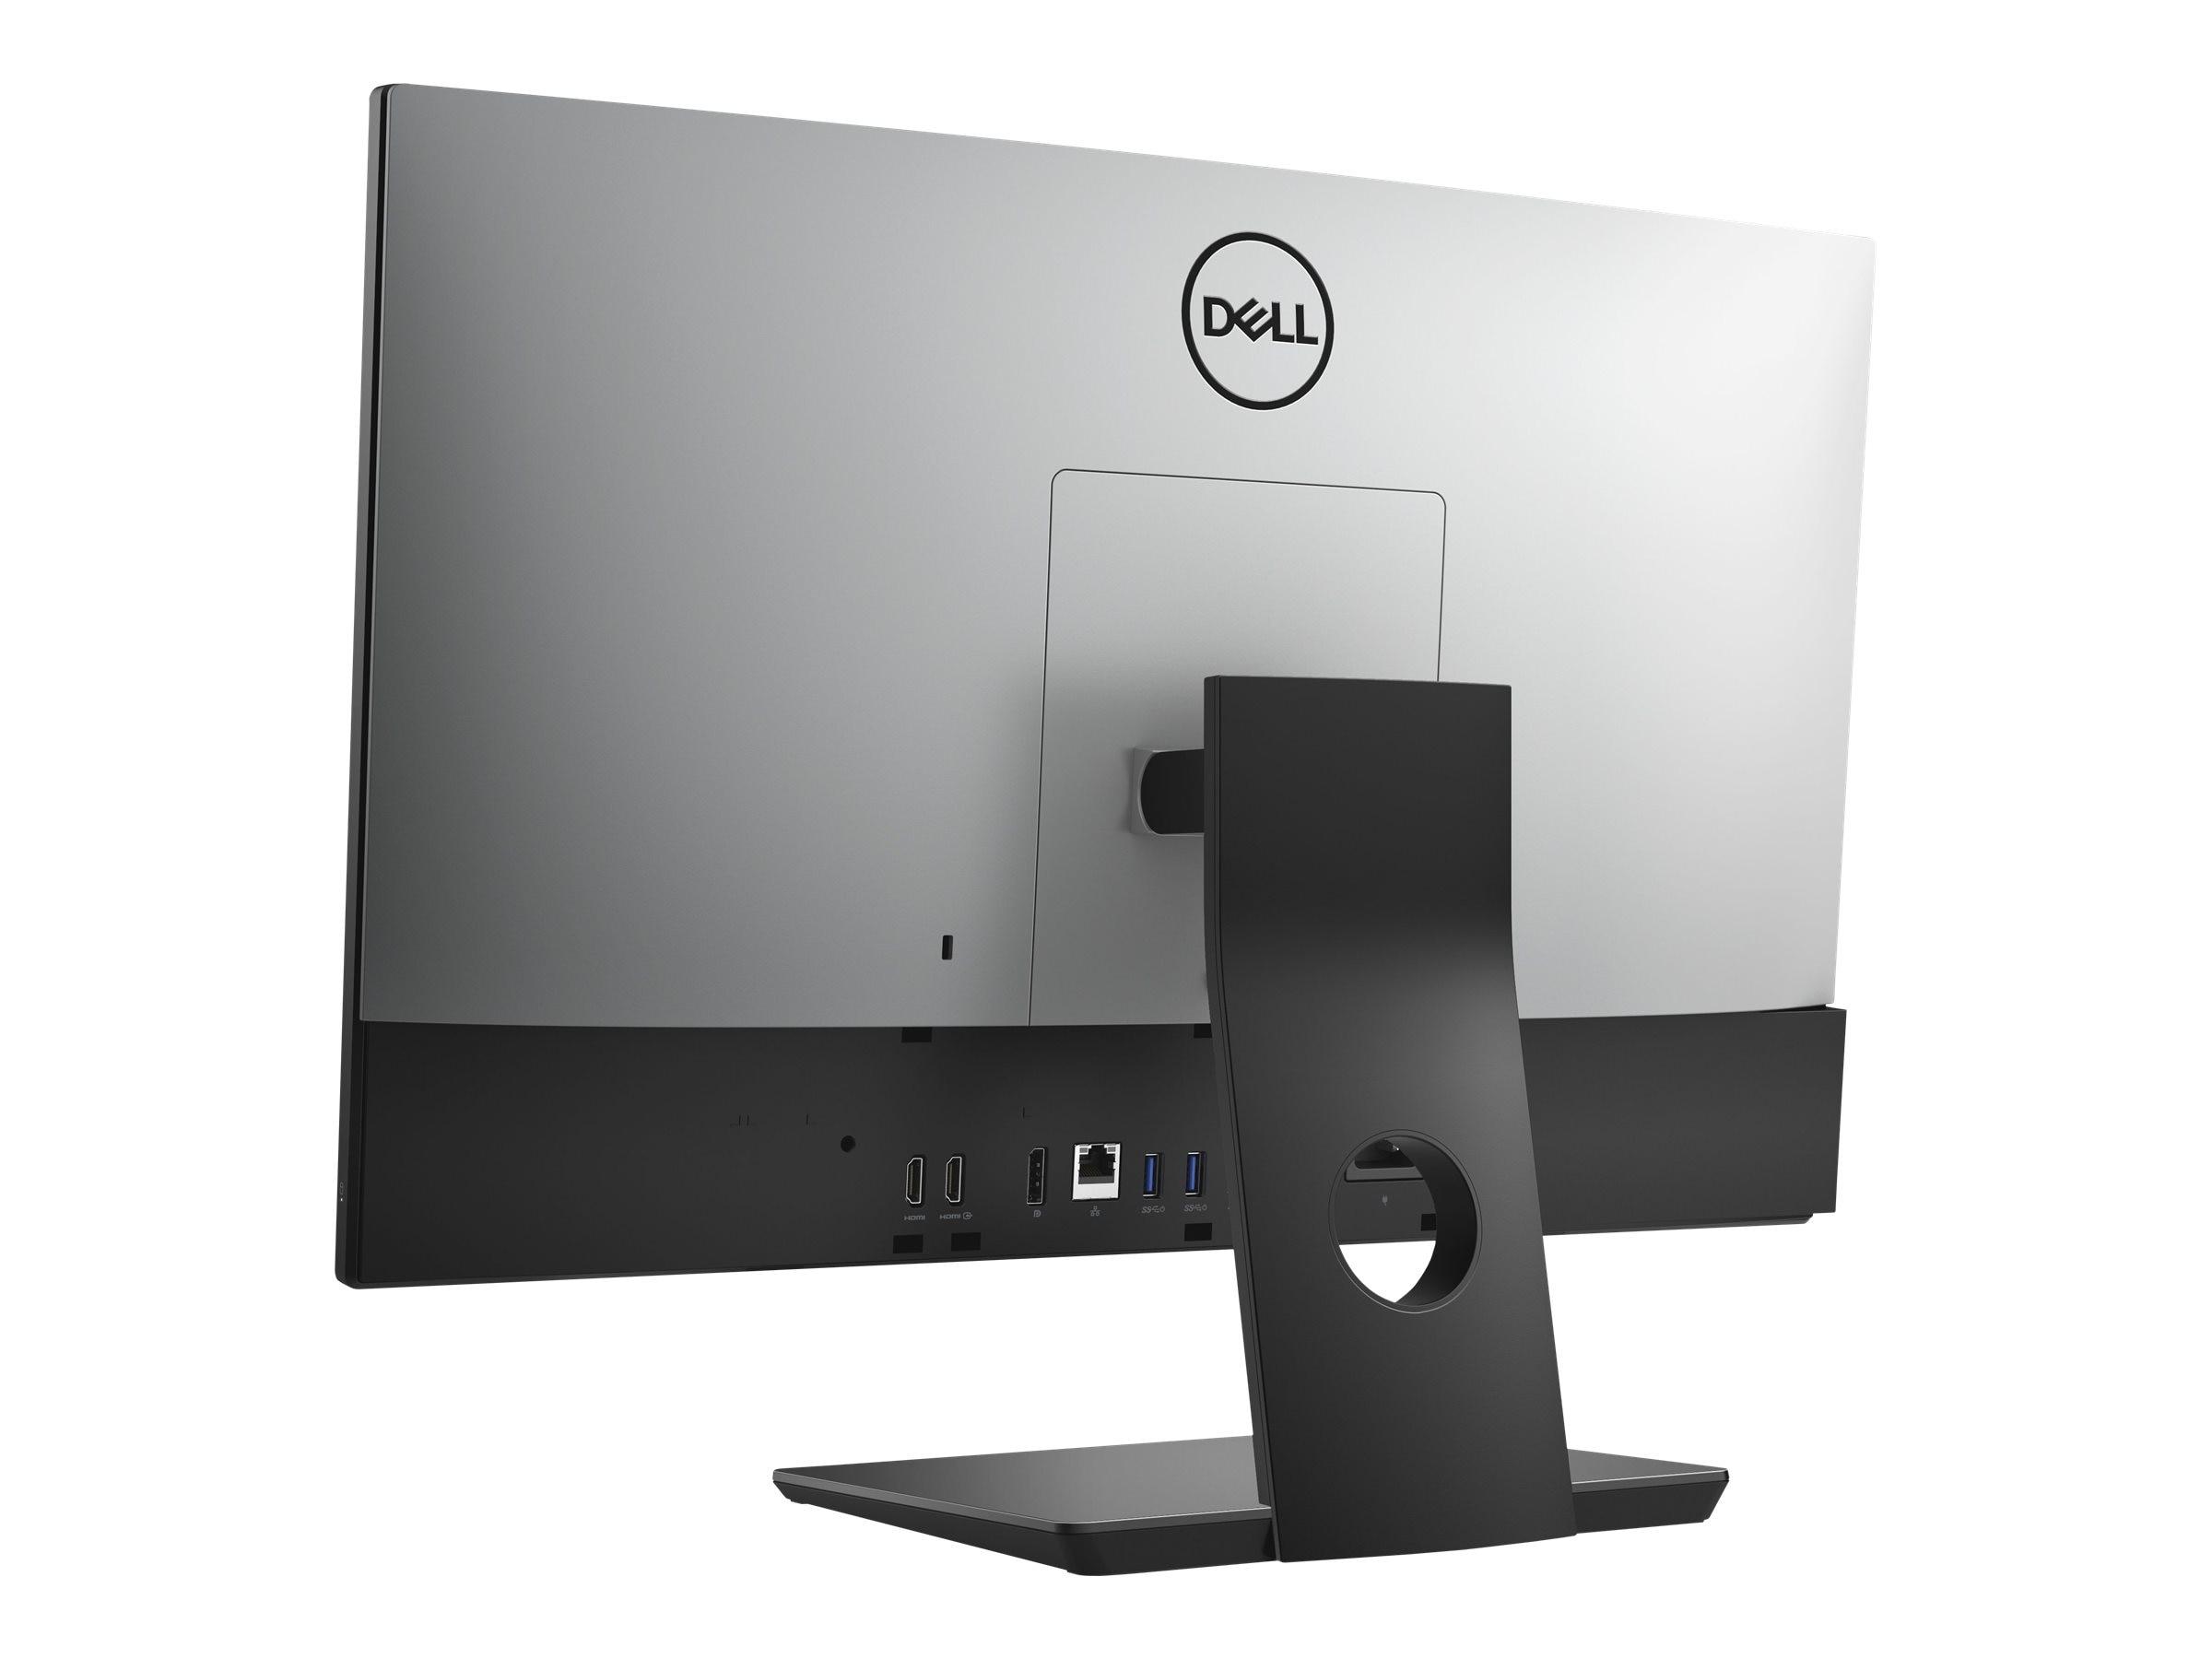 Dell OptiPlex 7460 AIO Core i5-8500 3 0GHz 8GB 256GB SSD UHD630 ac BT WC  23 8